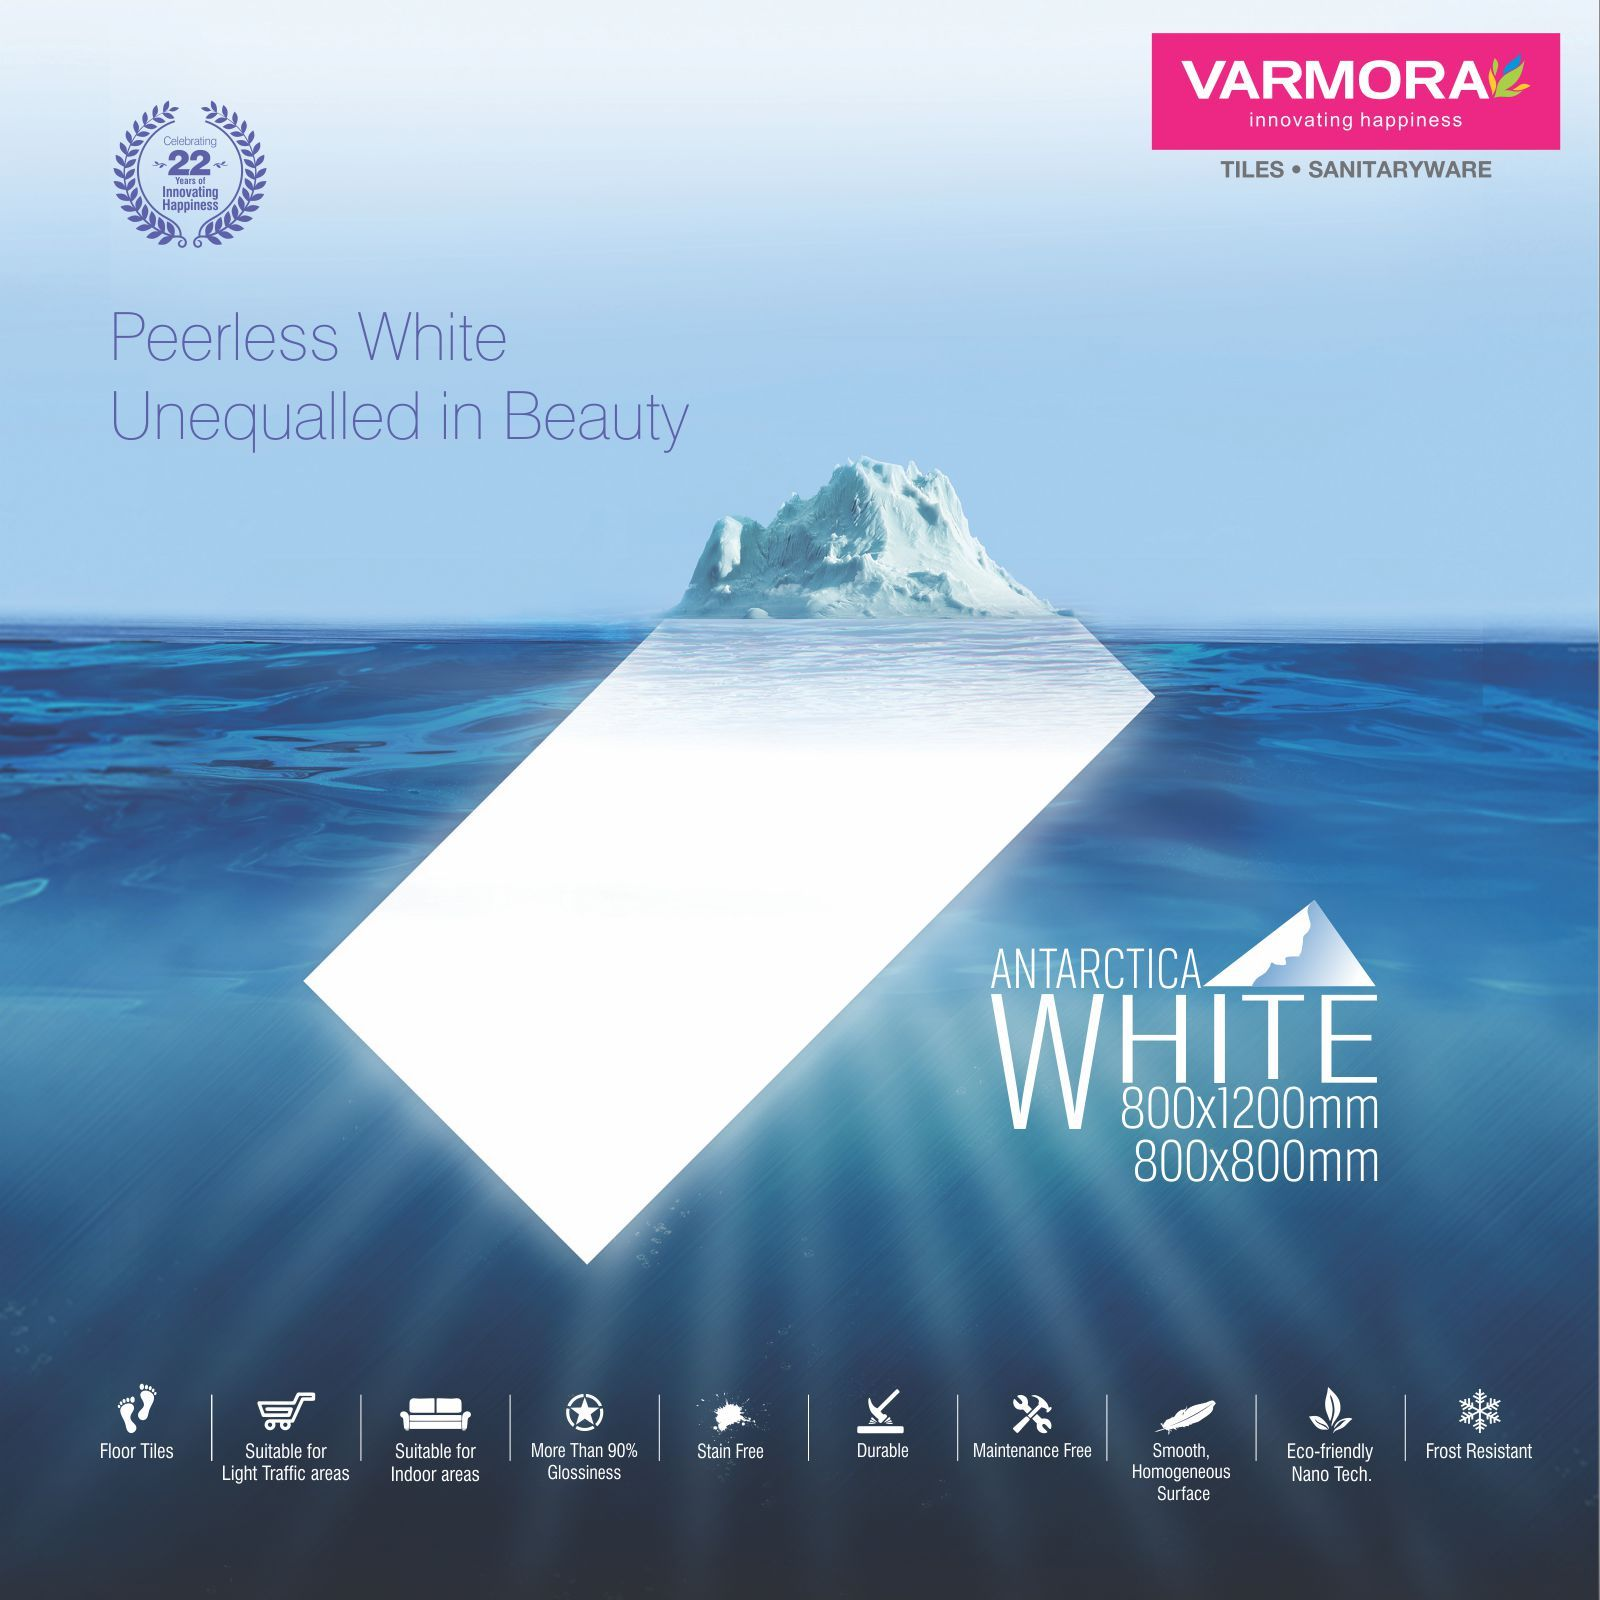 Varmora Granito Pvt Ltd introduced floor tiles which is Peerless ...